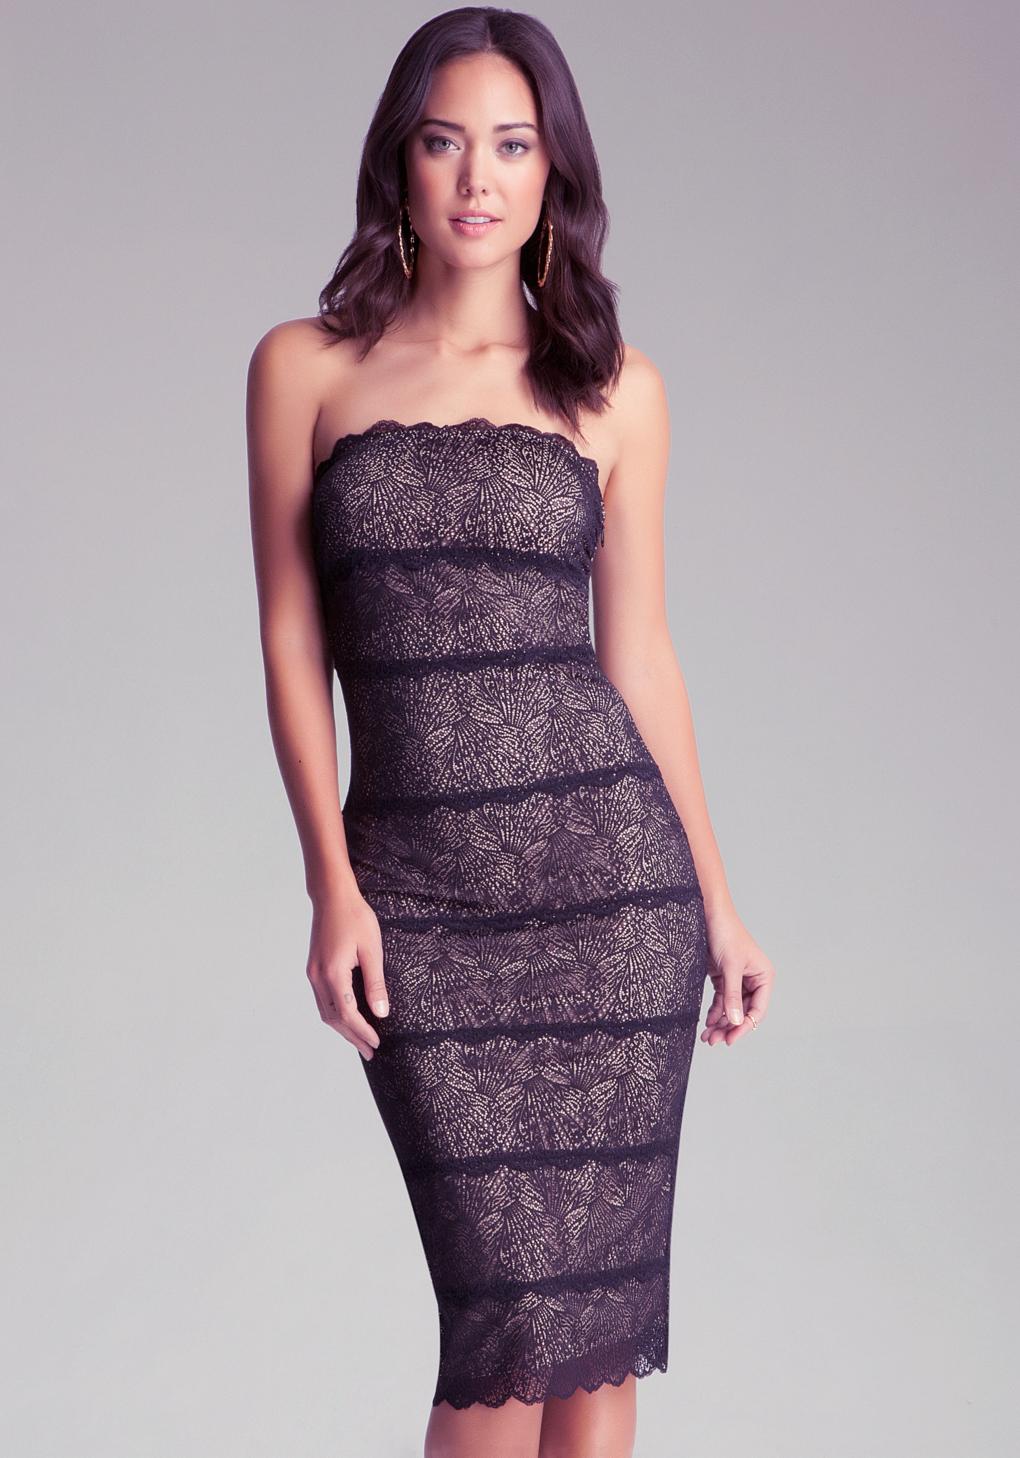 Lyst - Bebe Strapless Lace Midi Dress in Black 1c28b7d99